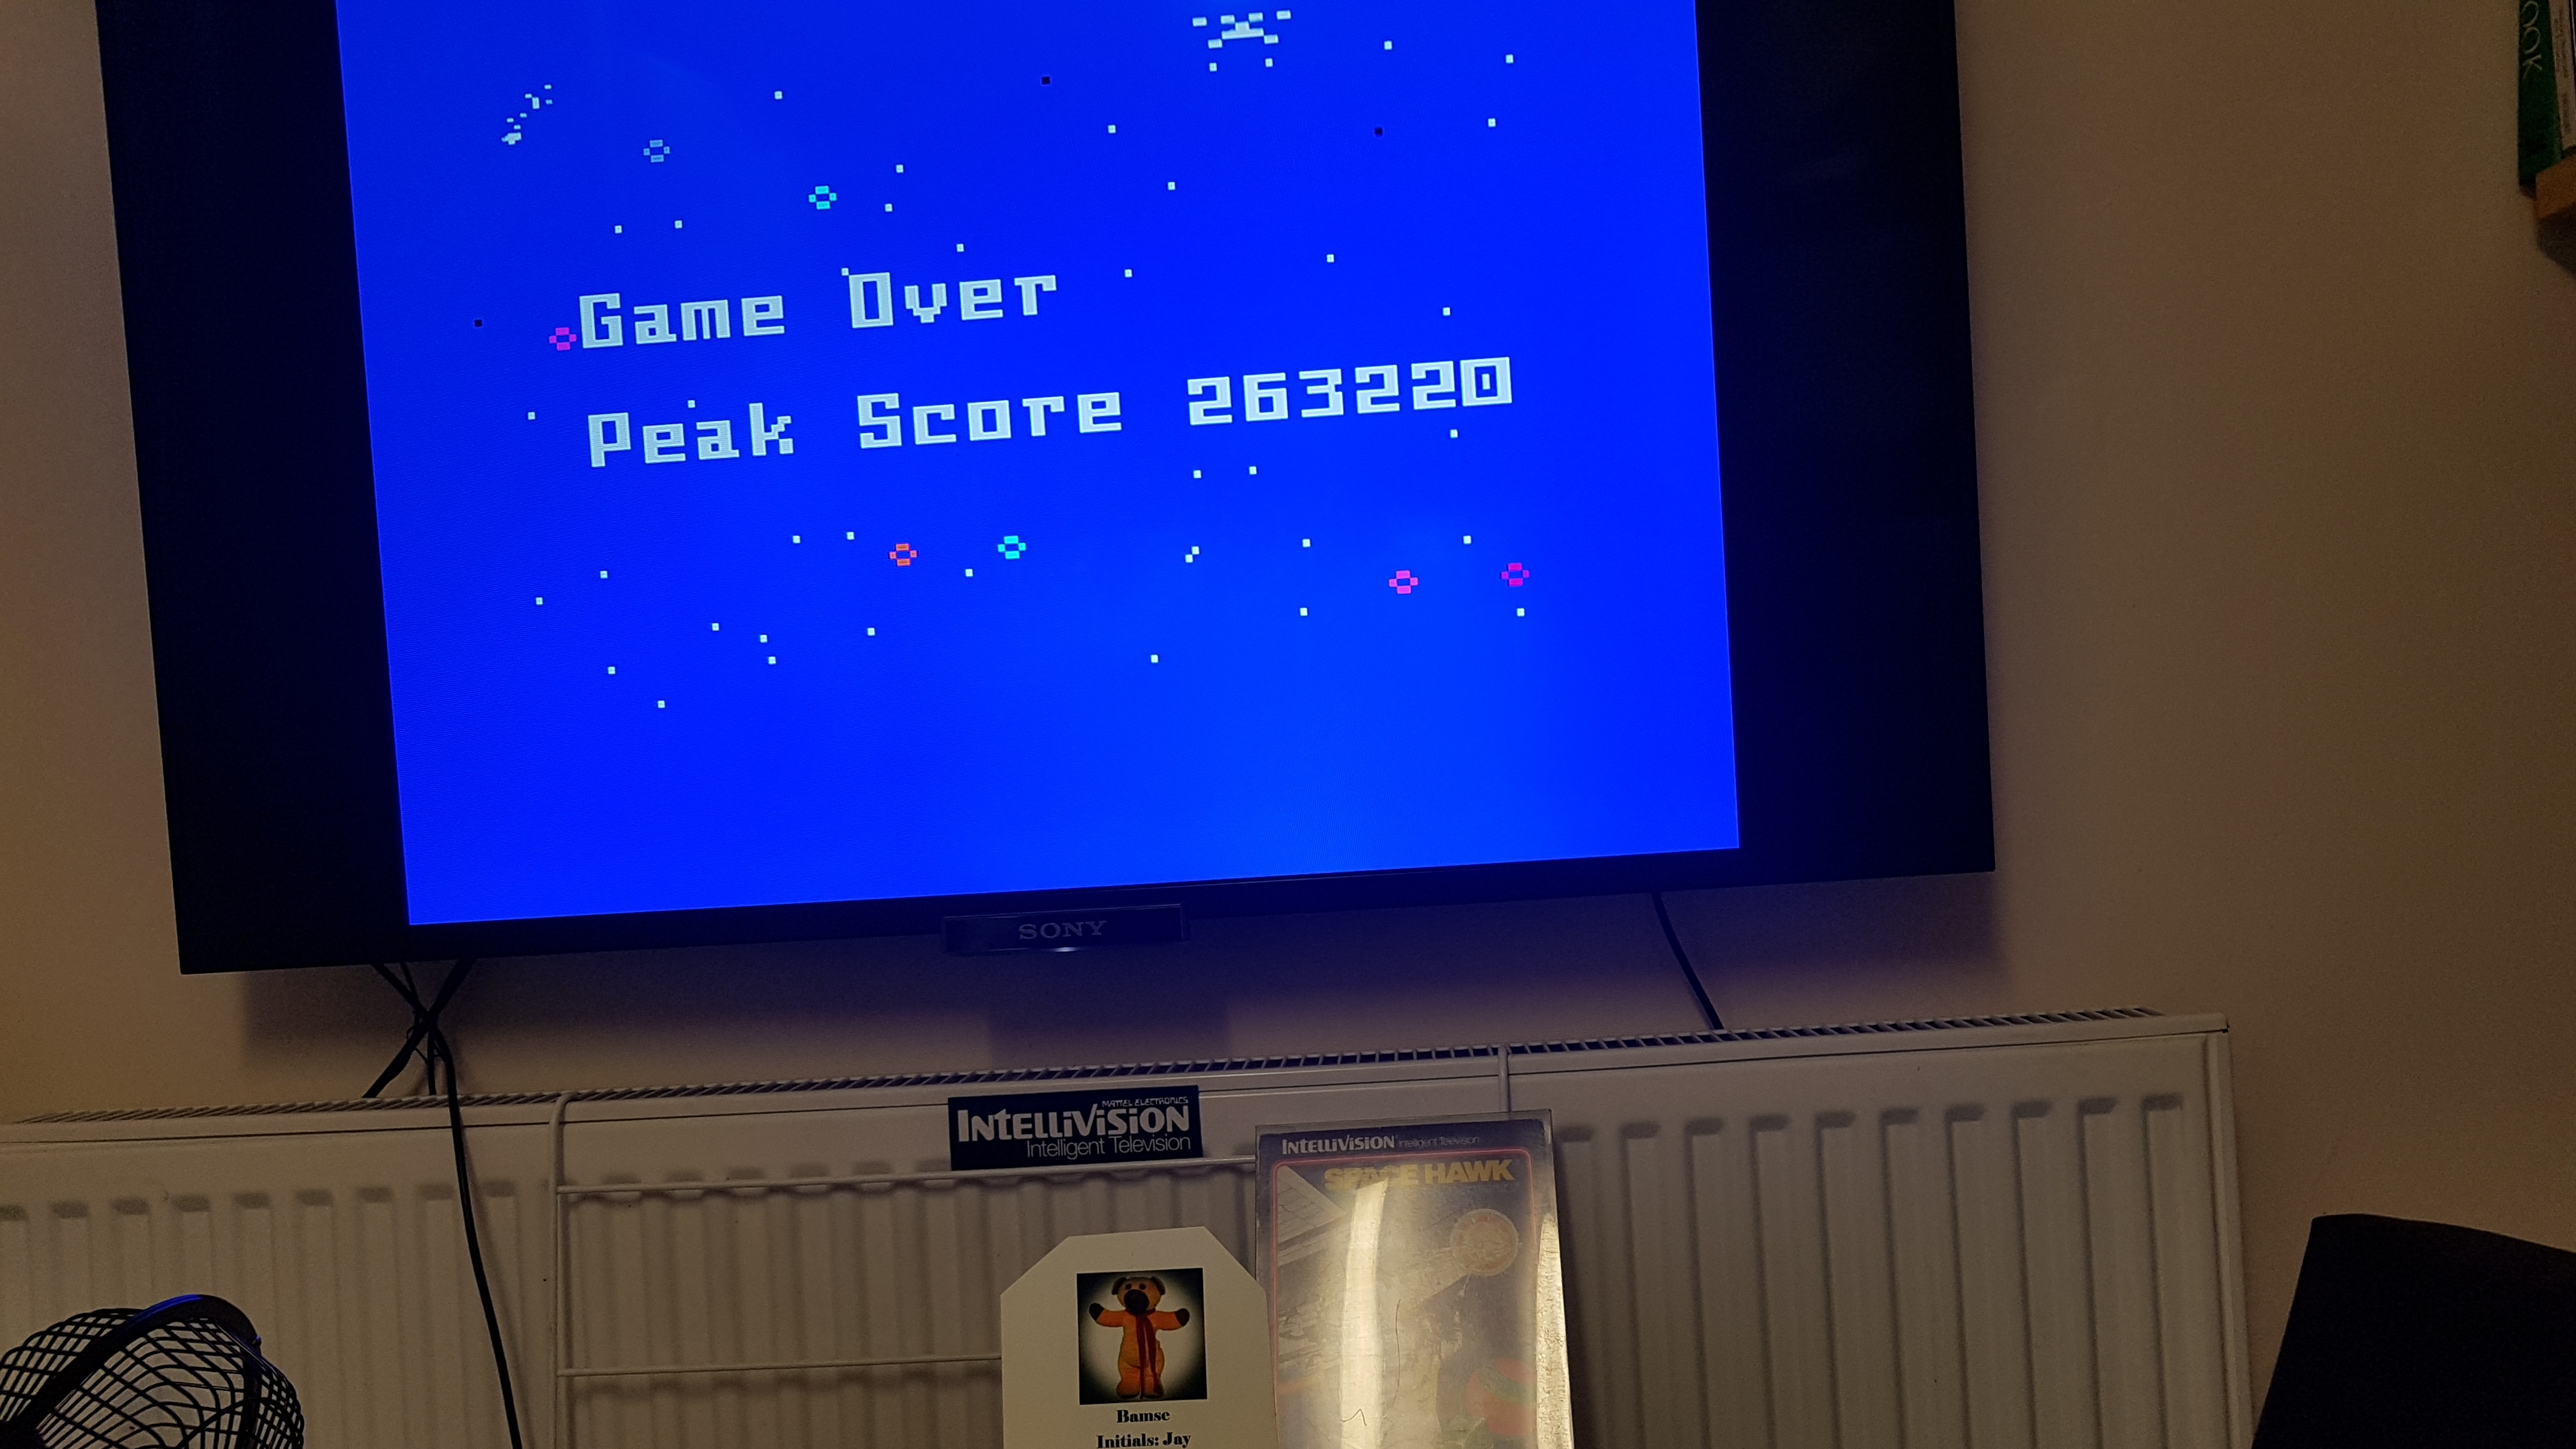 Space Hawk 263,220 points